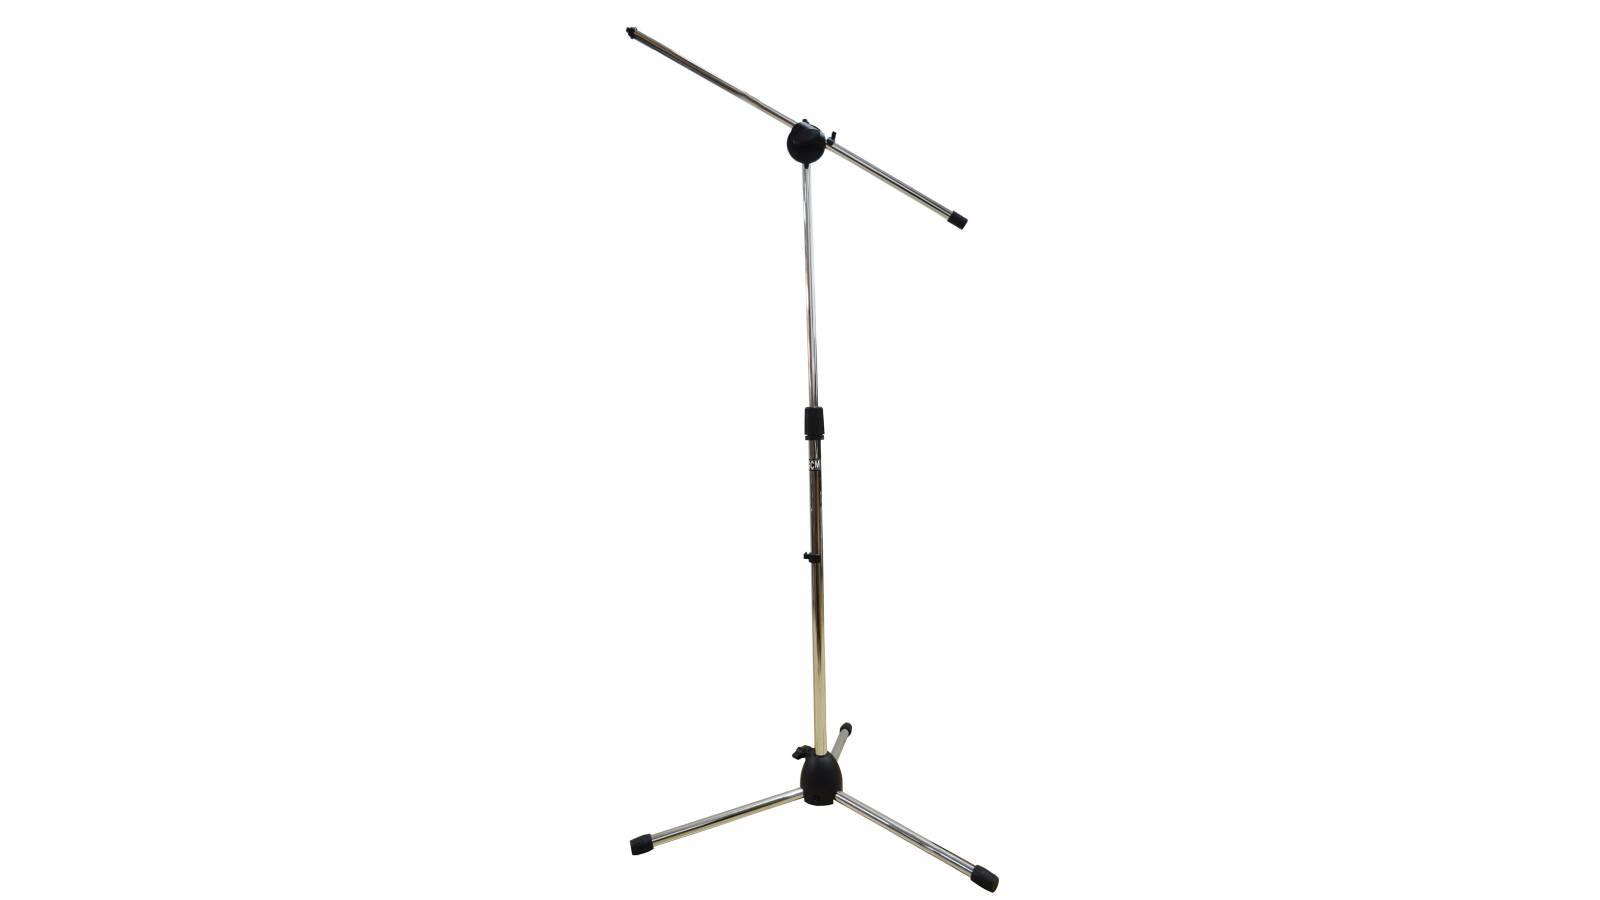 Jirafa, Soporte, Pie para Microfono Gcm 007s GCM Pro Plateada